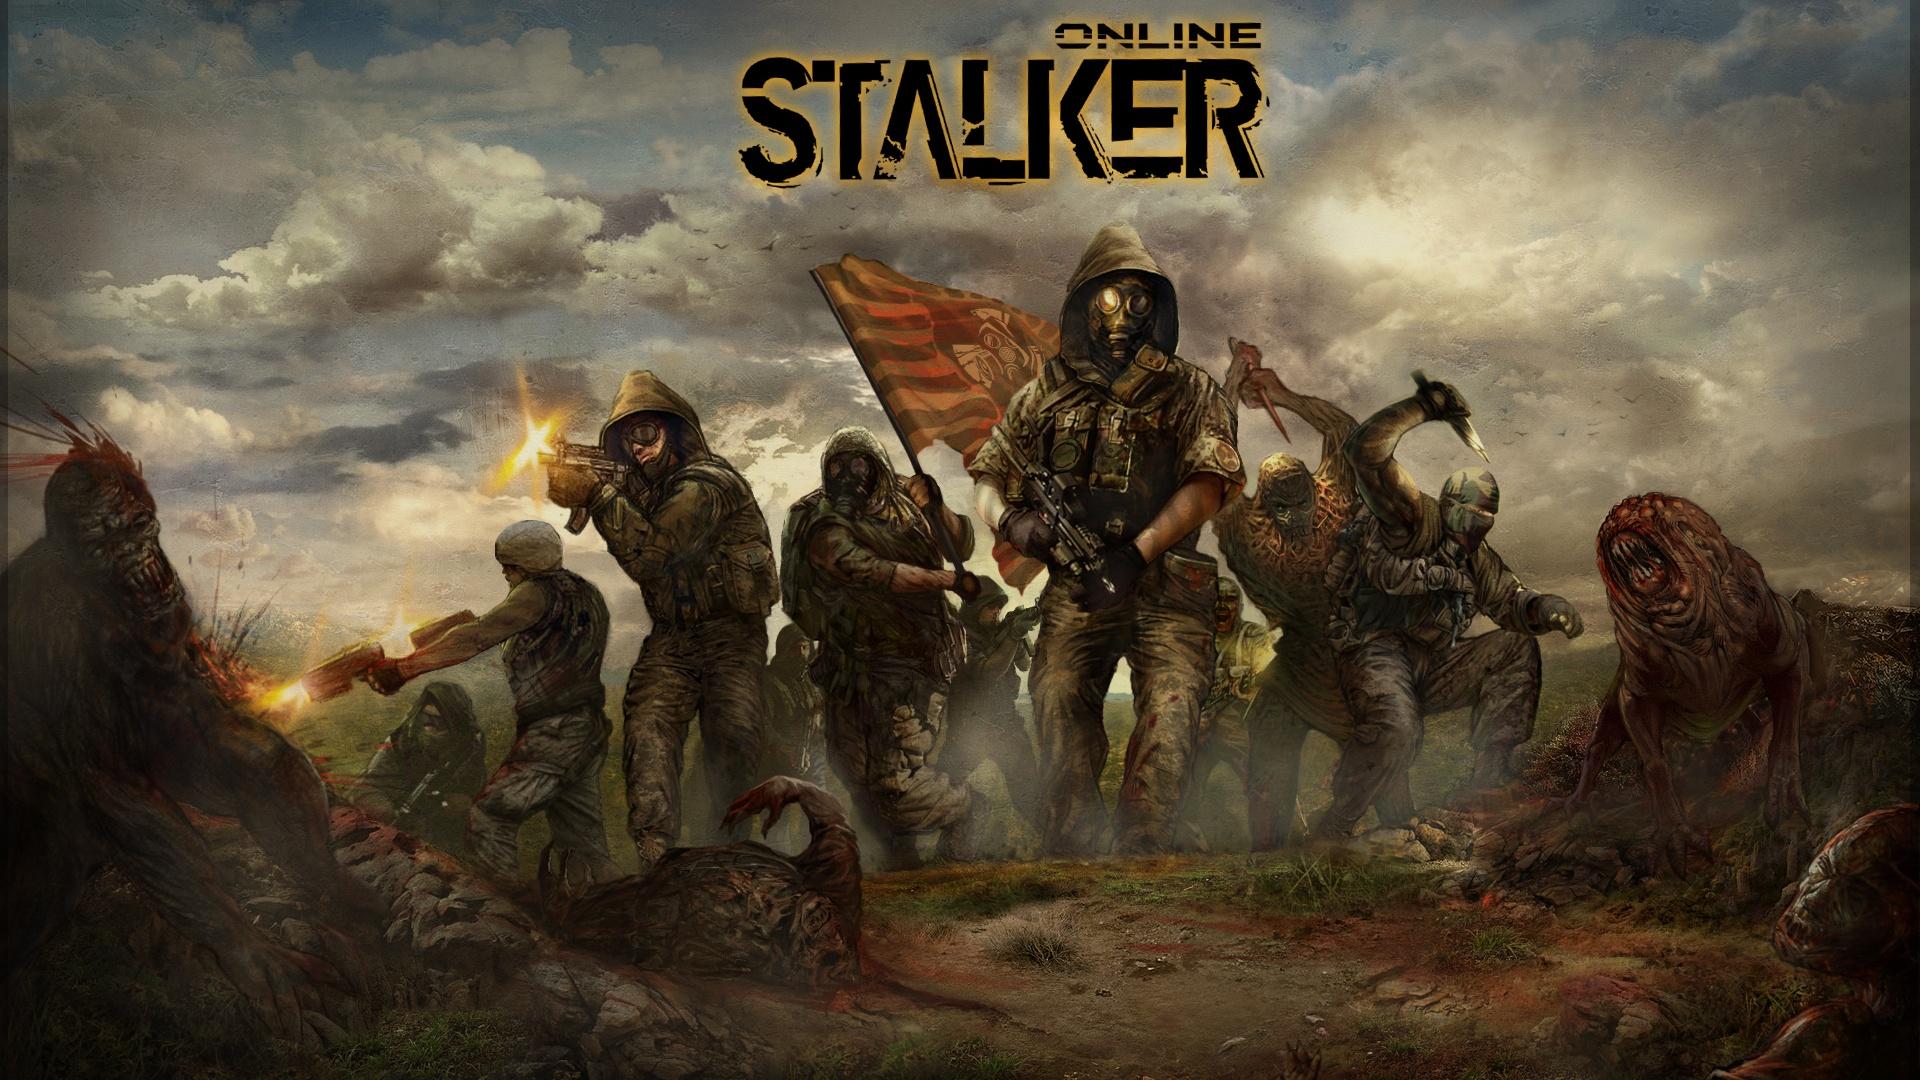 Wallpaper stalker online 1920x1200 hd picture image - Stalker wallpaper hd ...